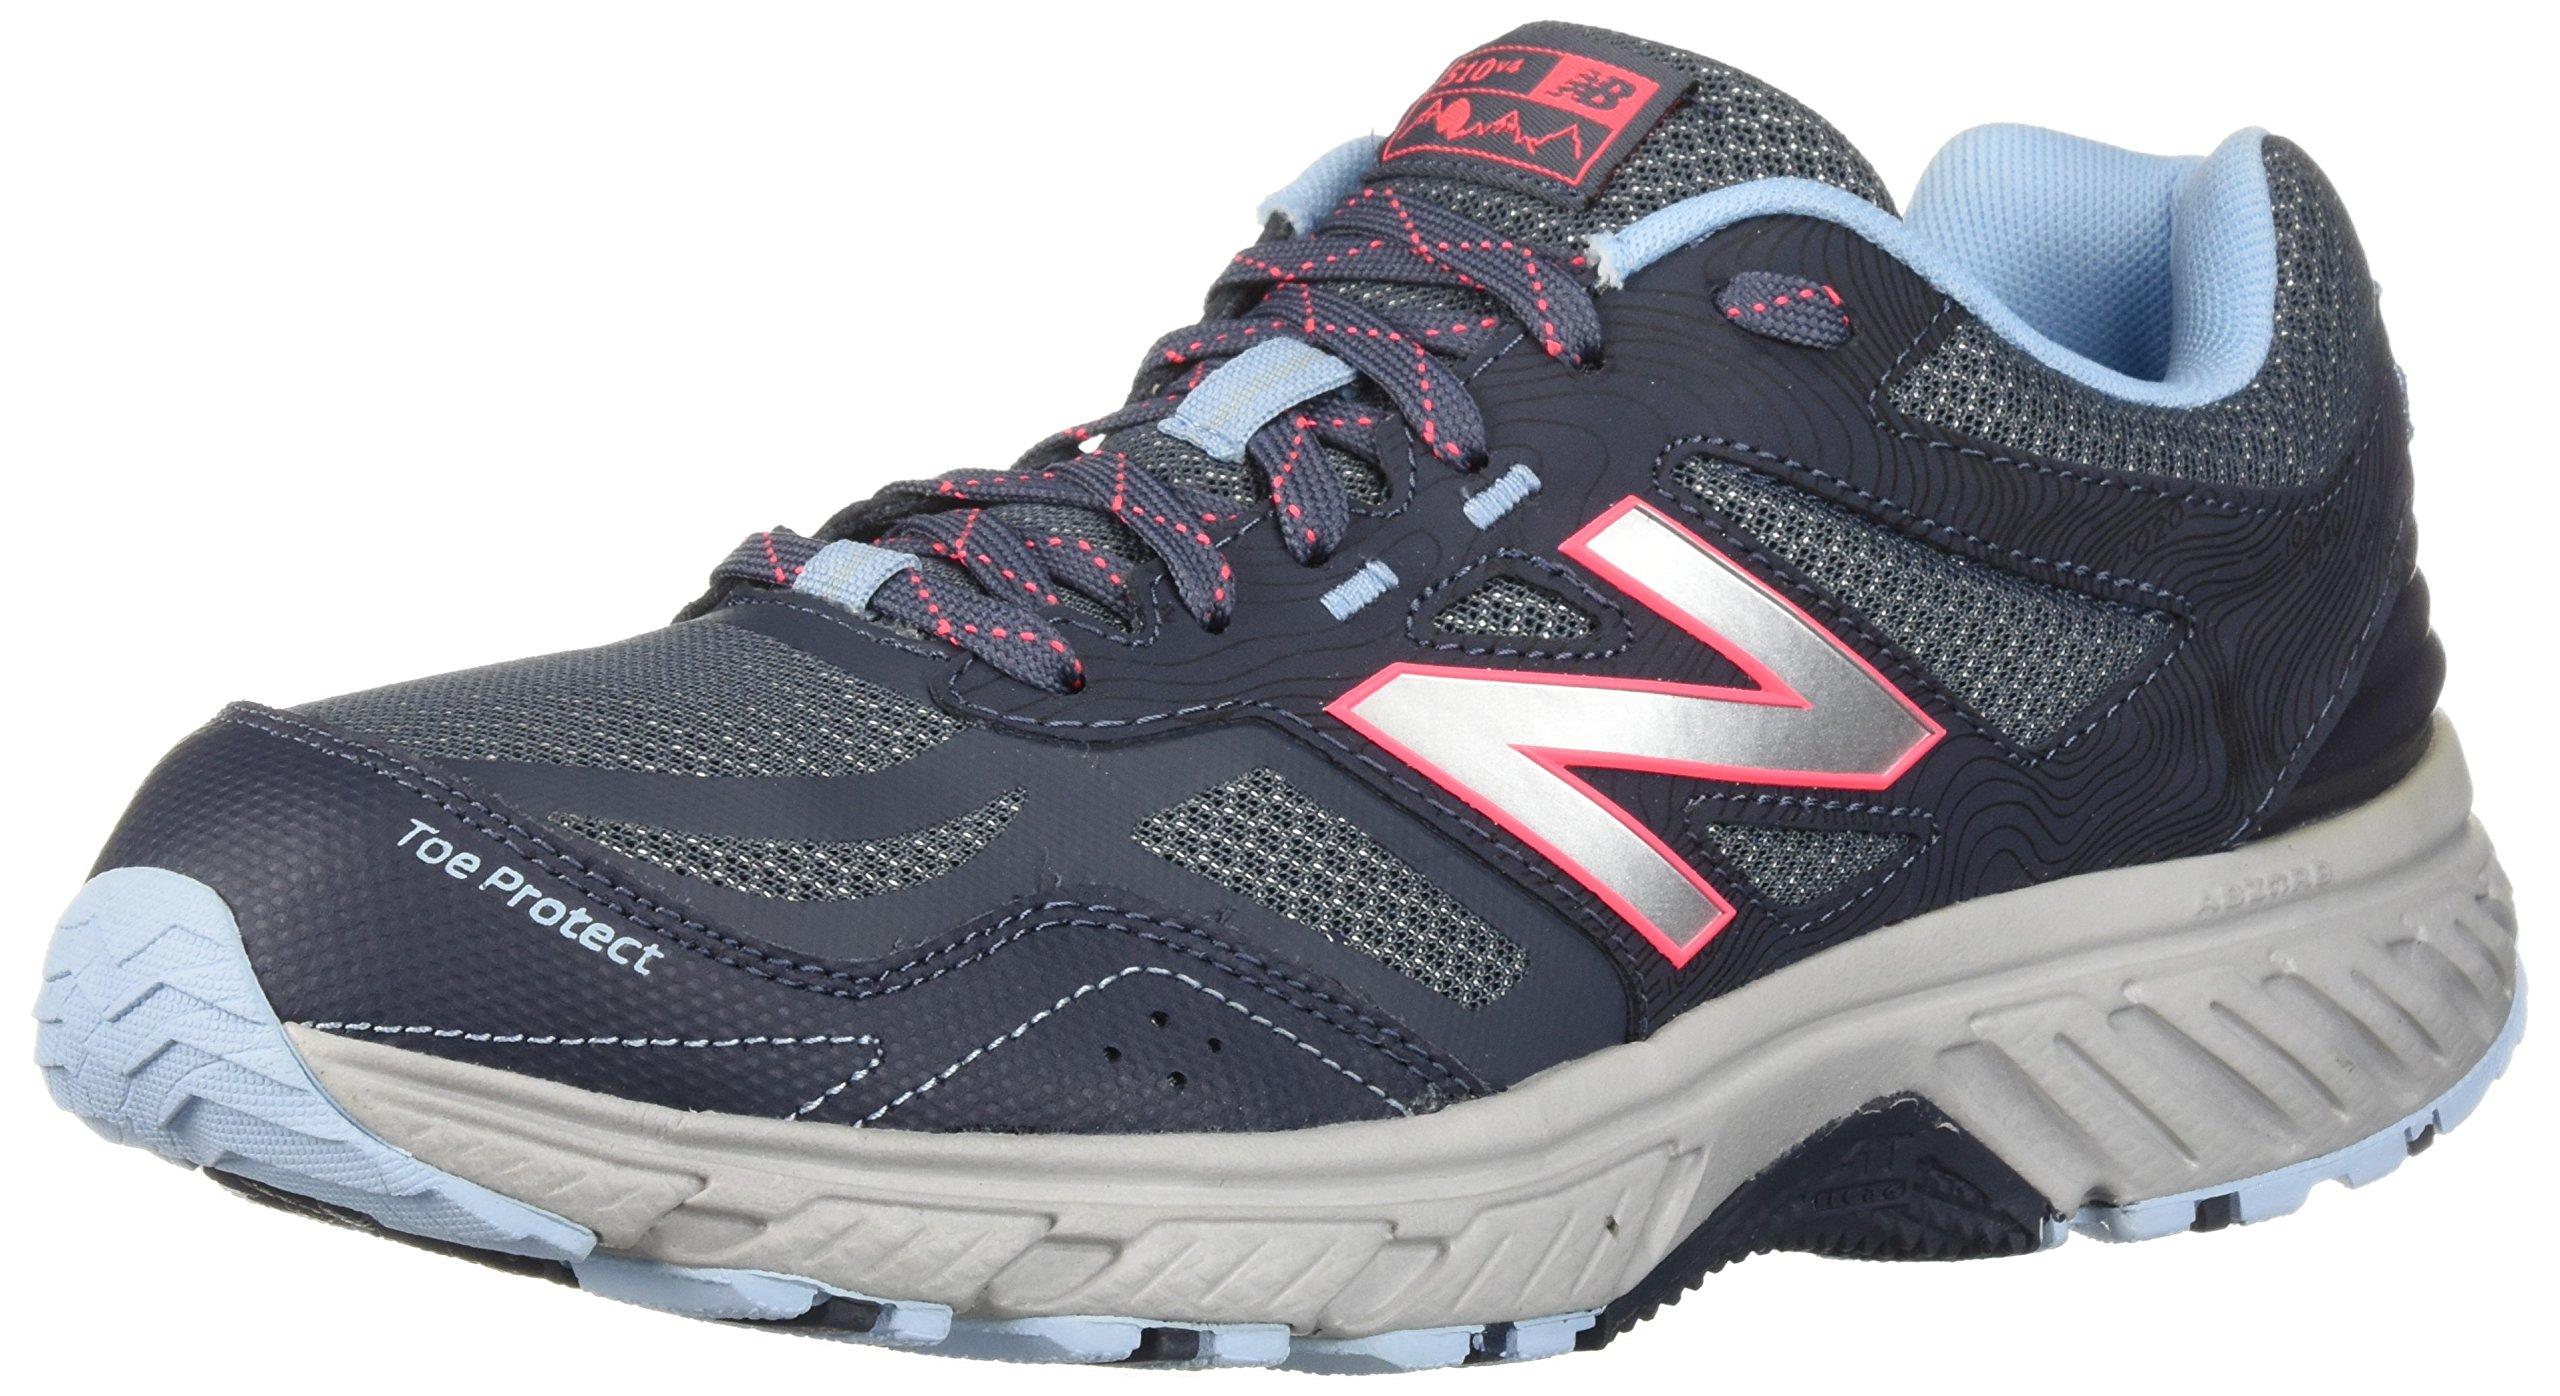 New Balance Women's 510v4 Cushioning Trail Running Shoe, Thunder, 5 D US